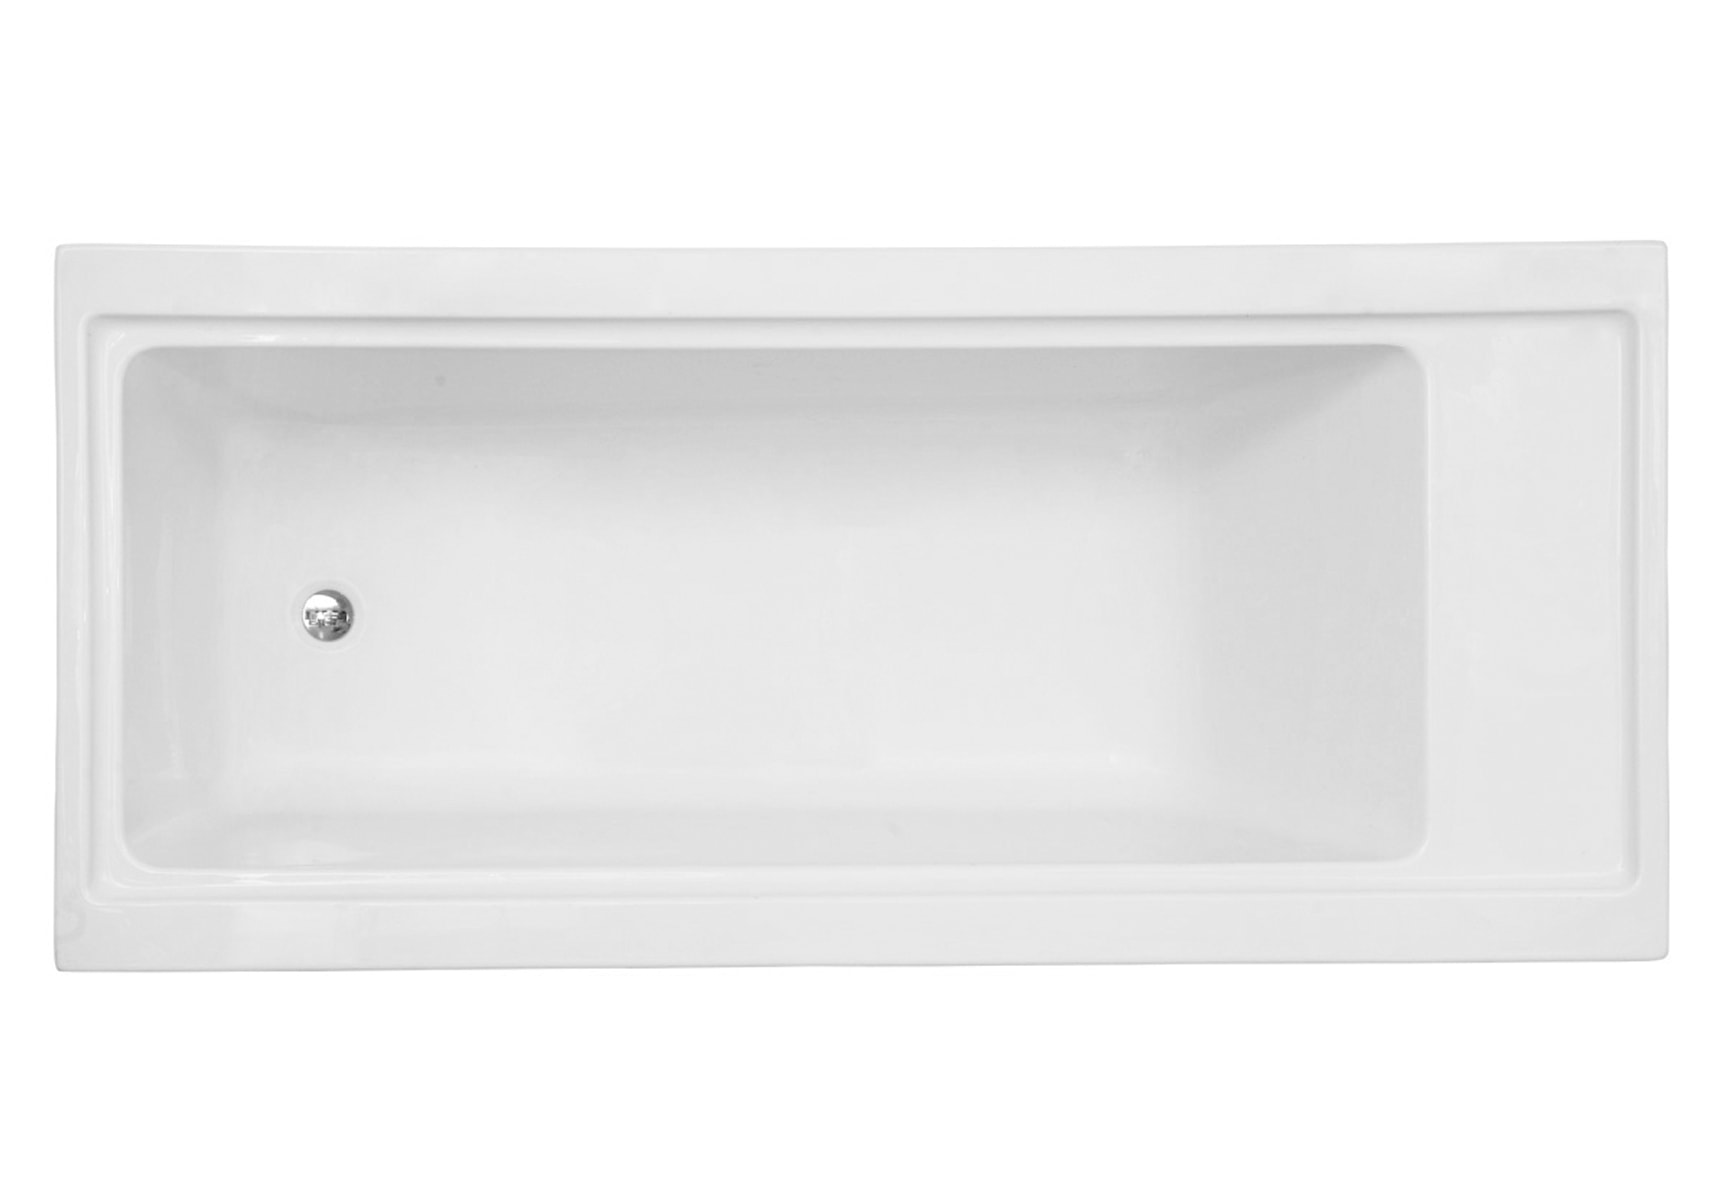 4 Life Pure Rectangular Bathtub